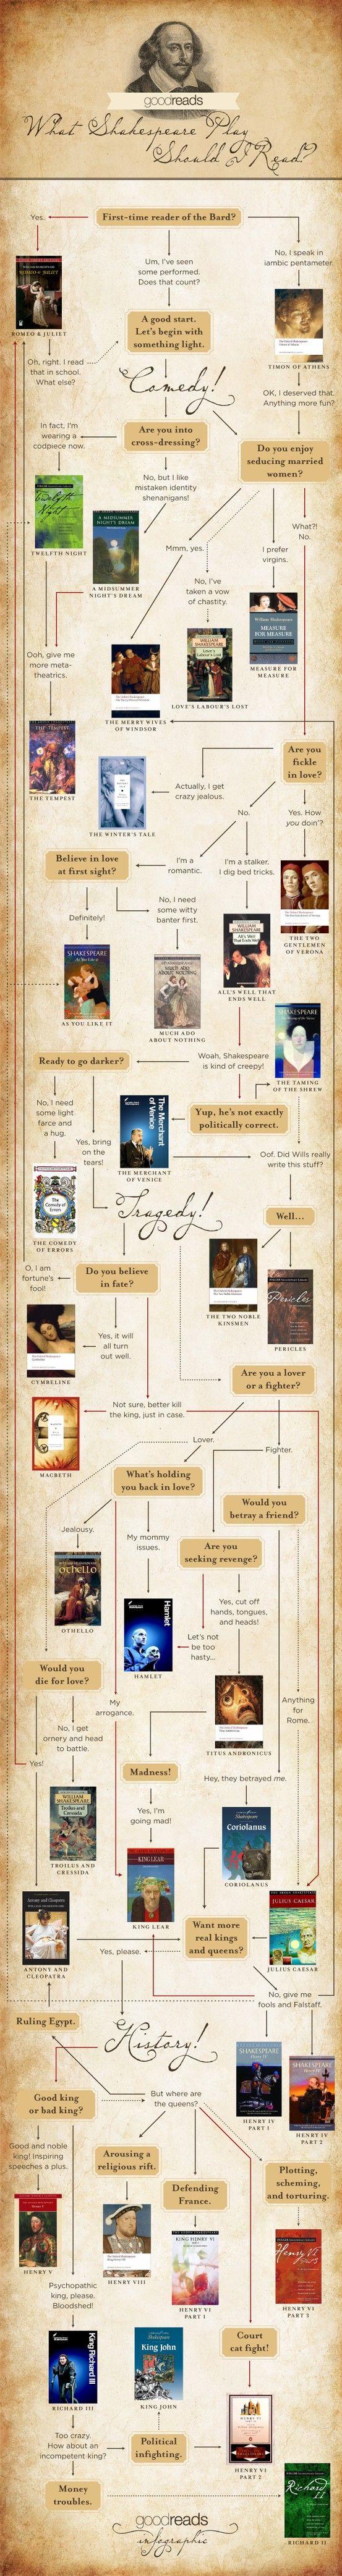 Shakespeare's birthday.